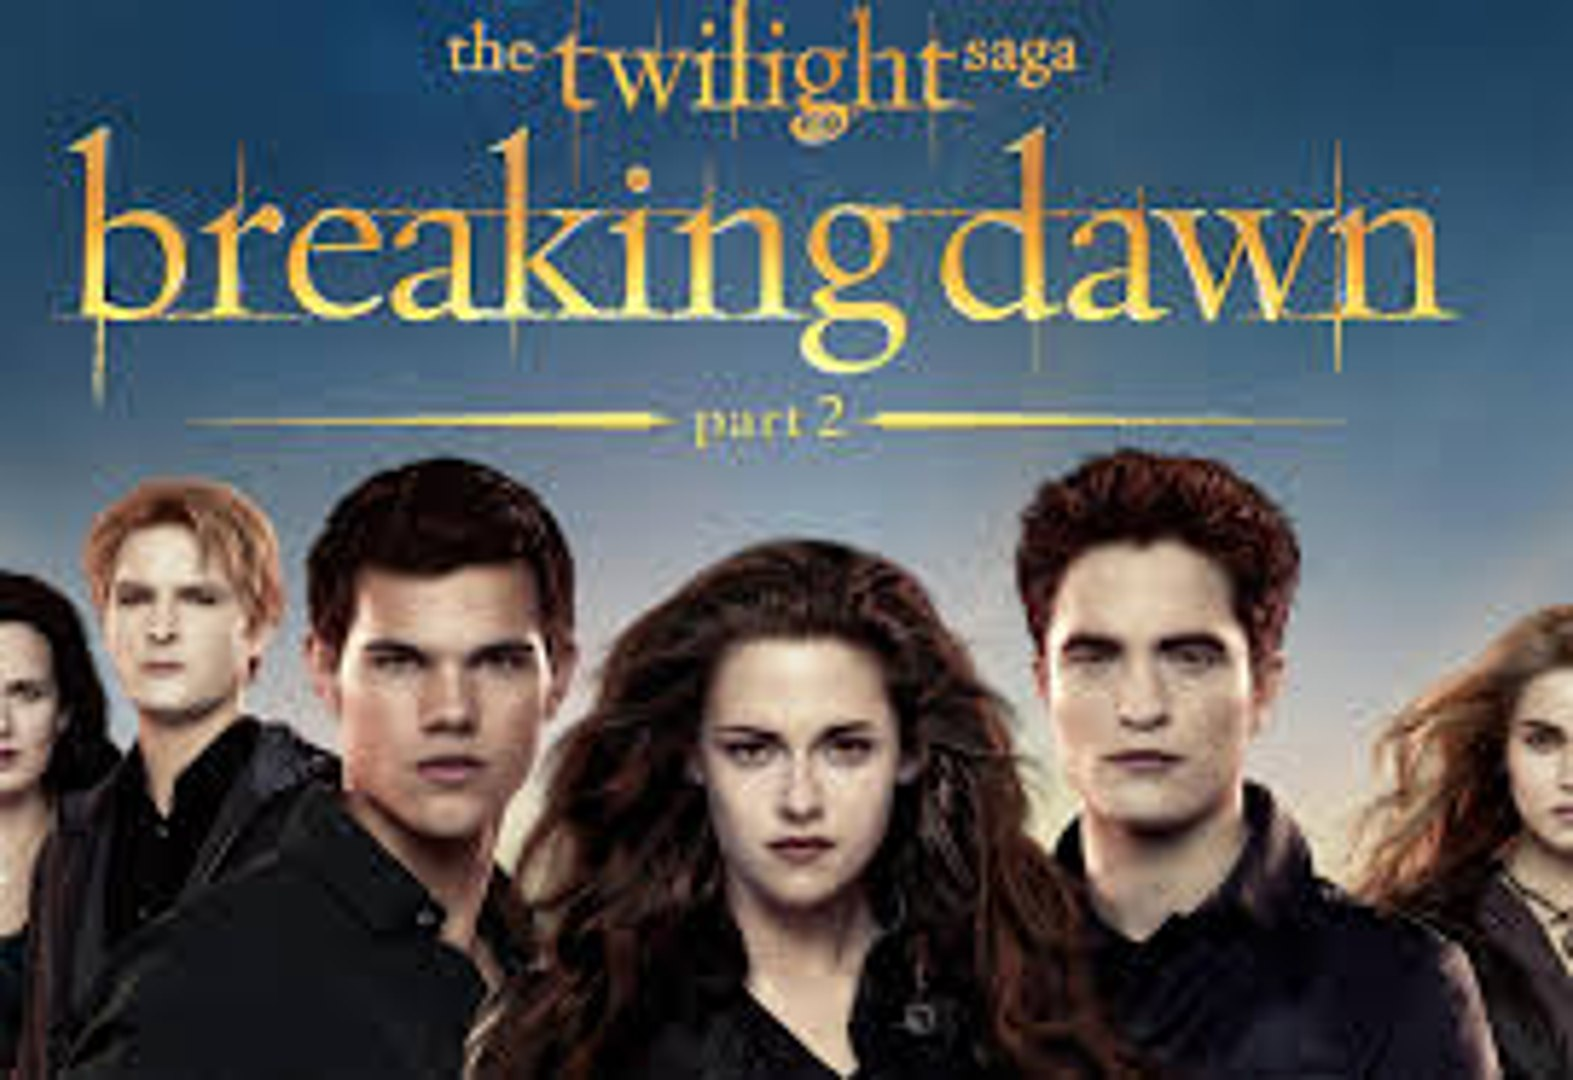 The Twilight Saga Breaking Dawn Part 2 2012 Full Movie Video Dailymotion